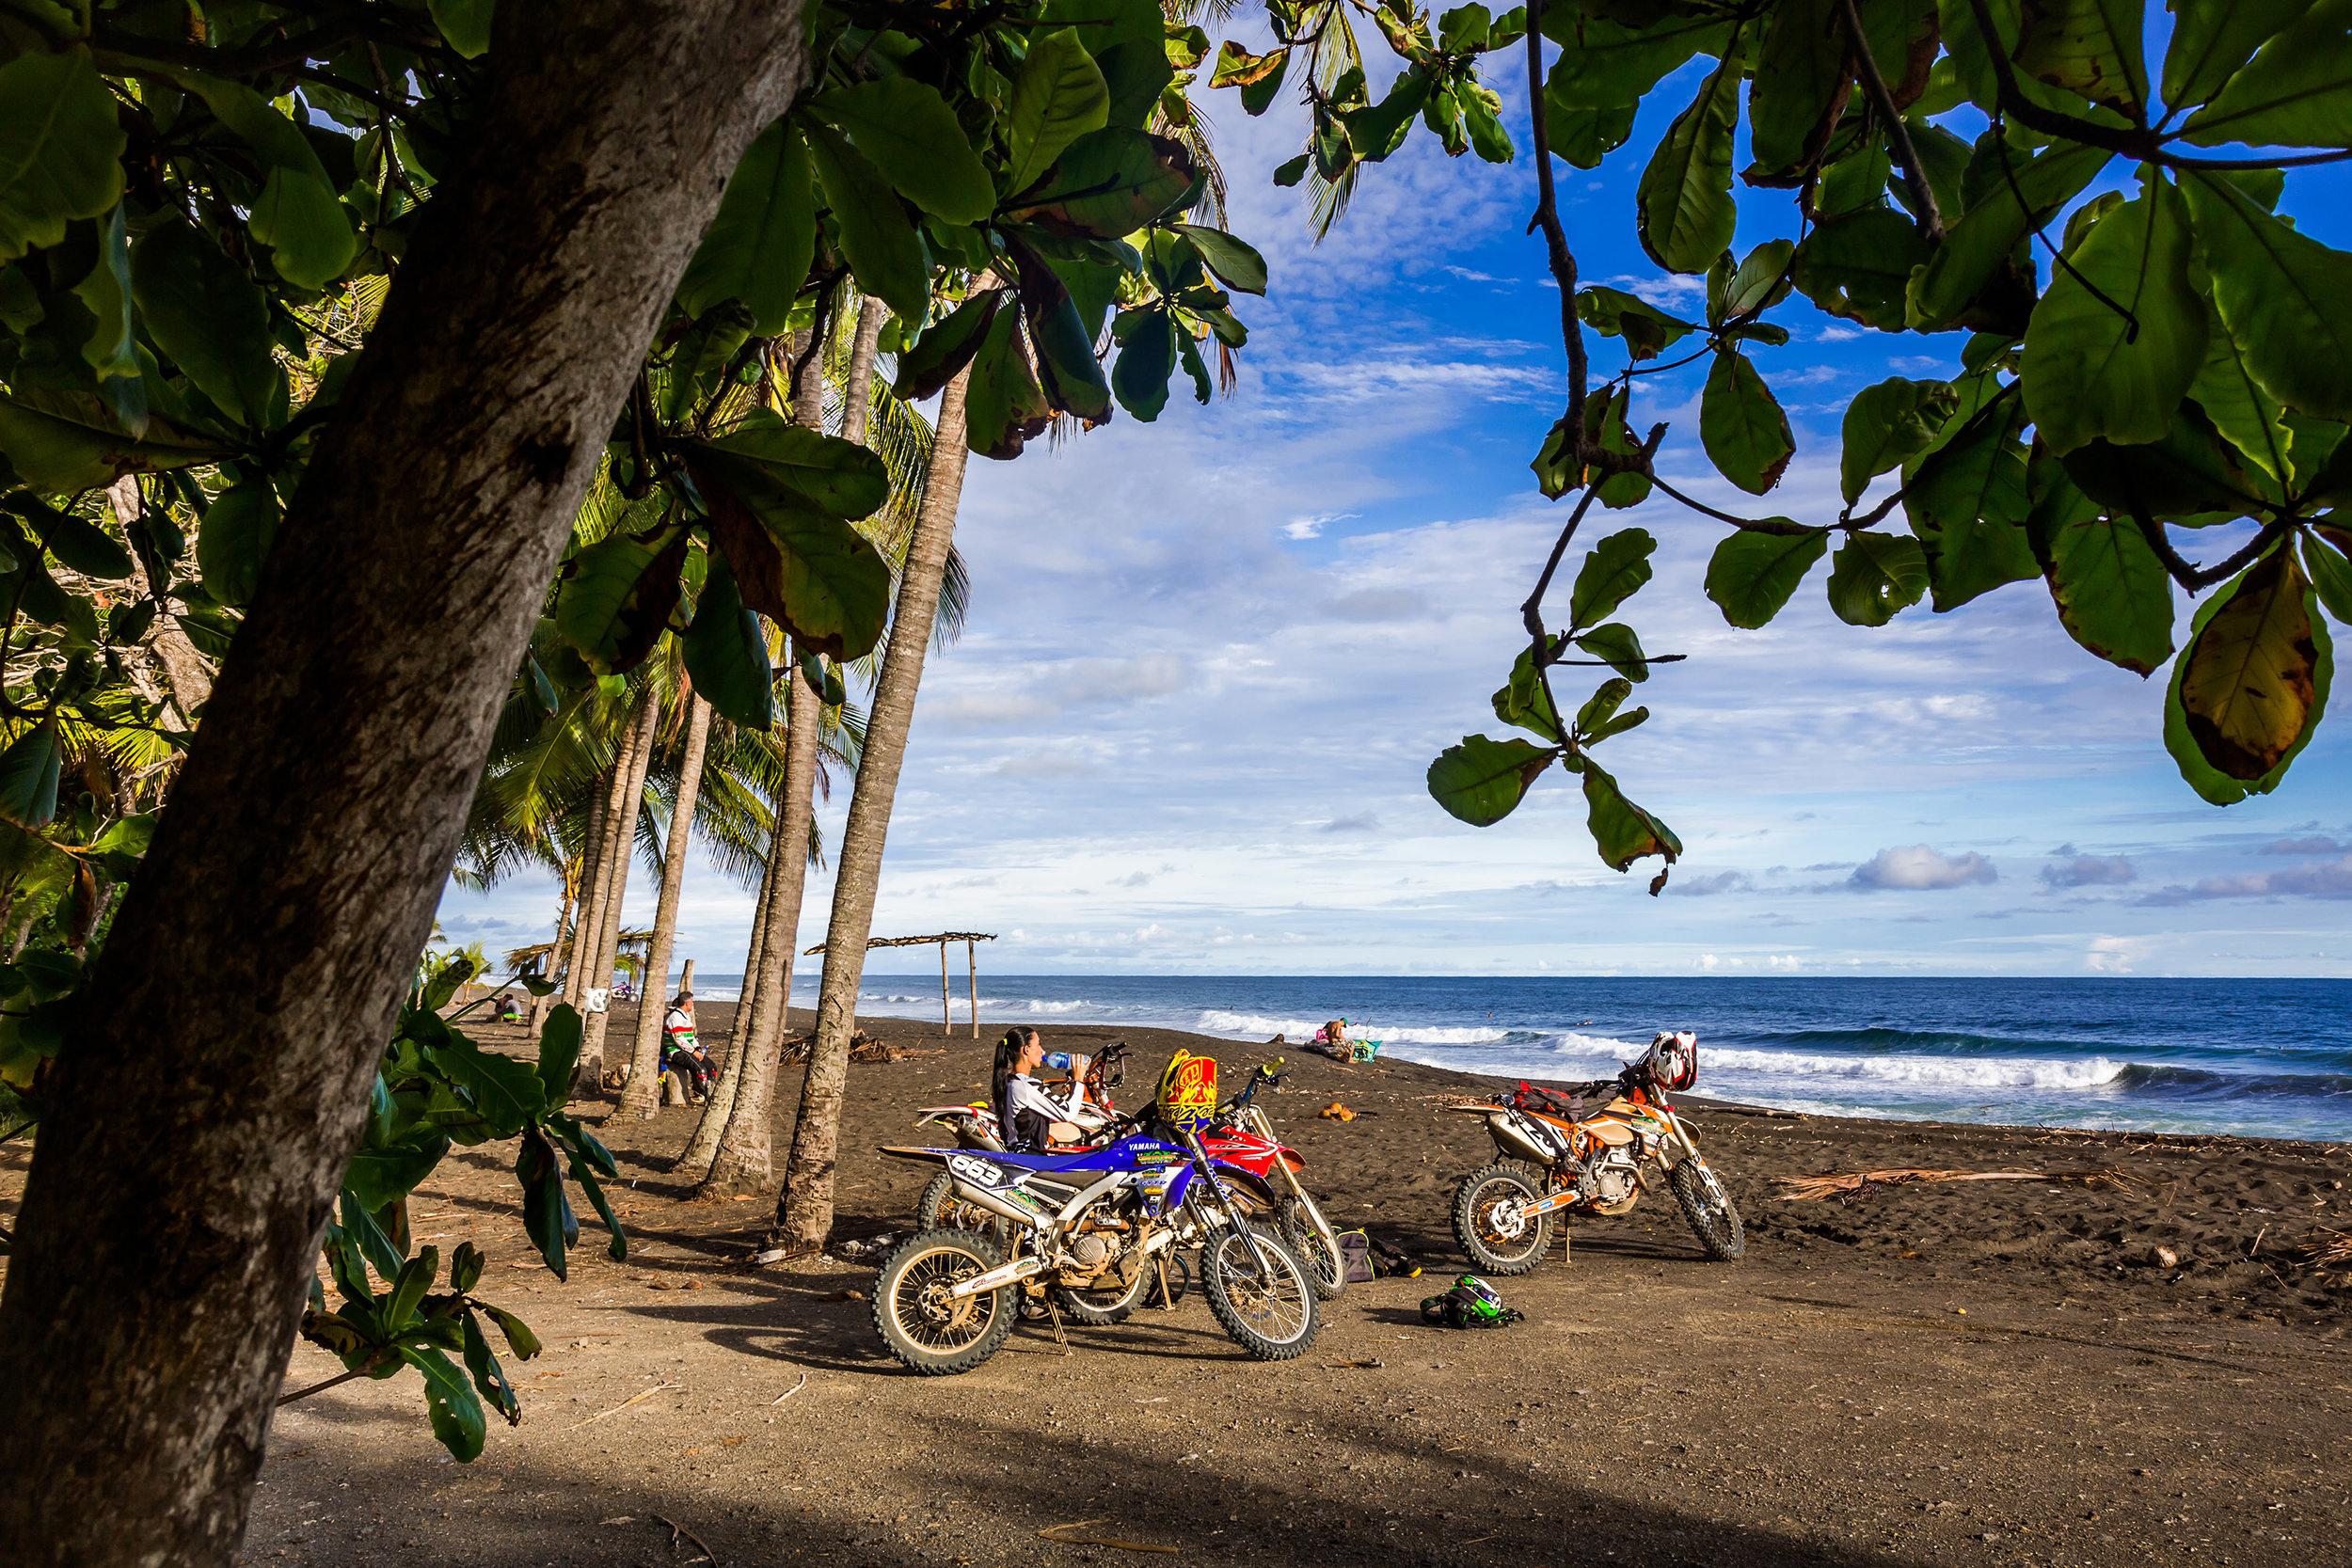 Costa_Rica-ODV_5501.jpg